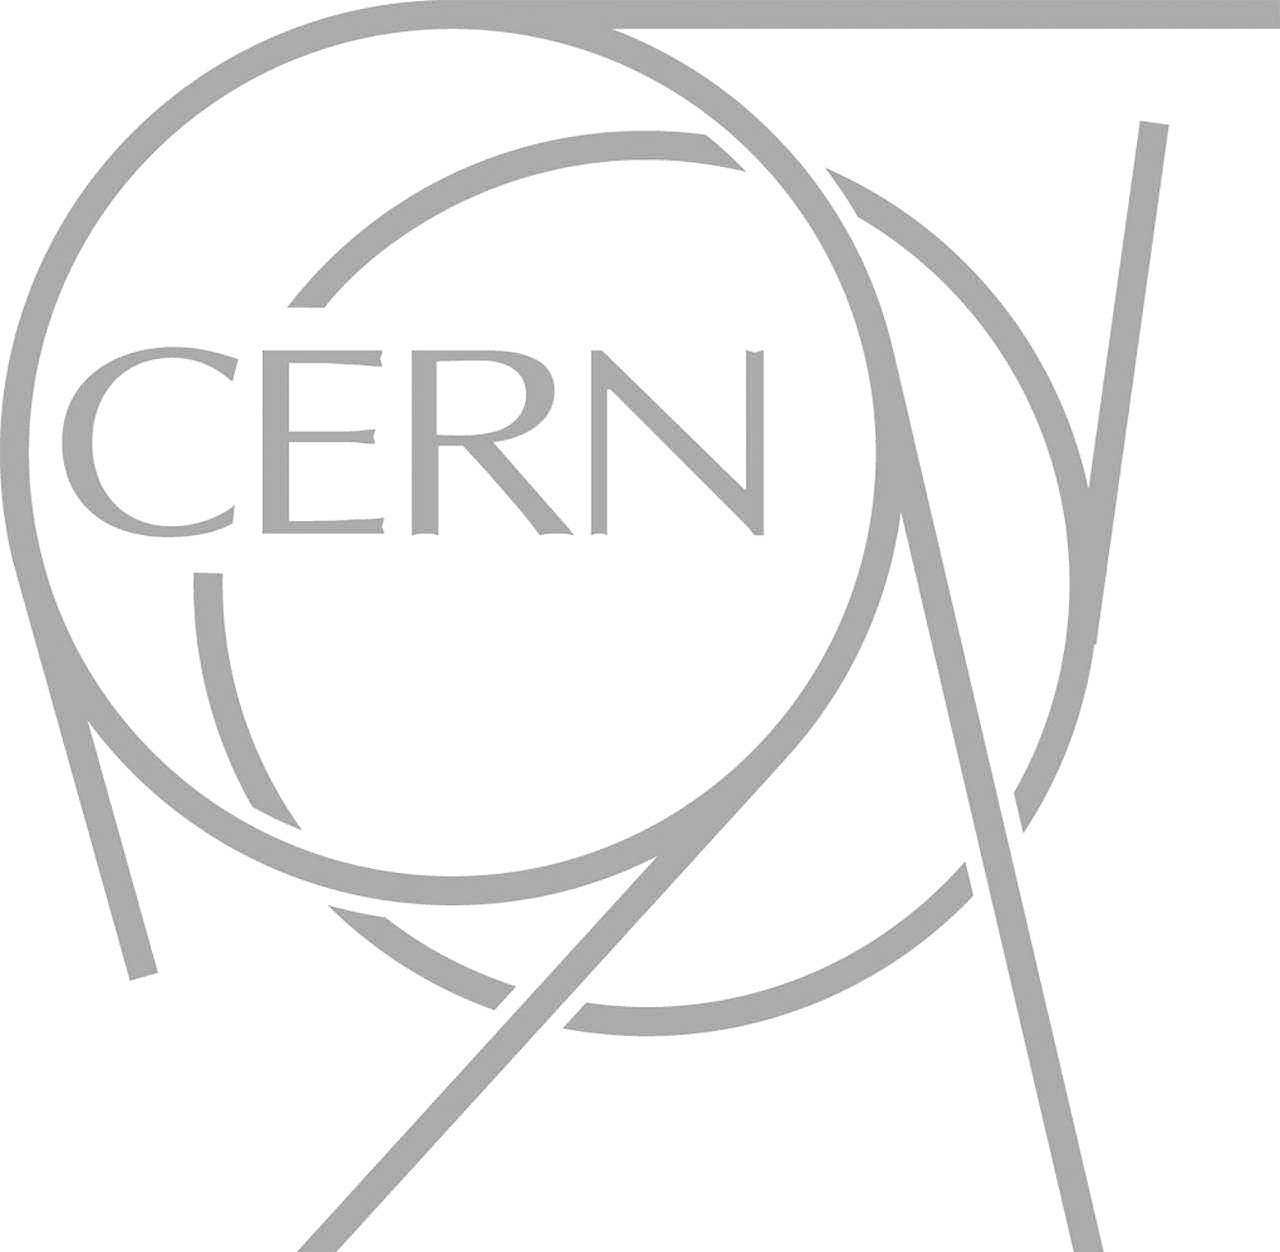 cern logo.jpg